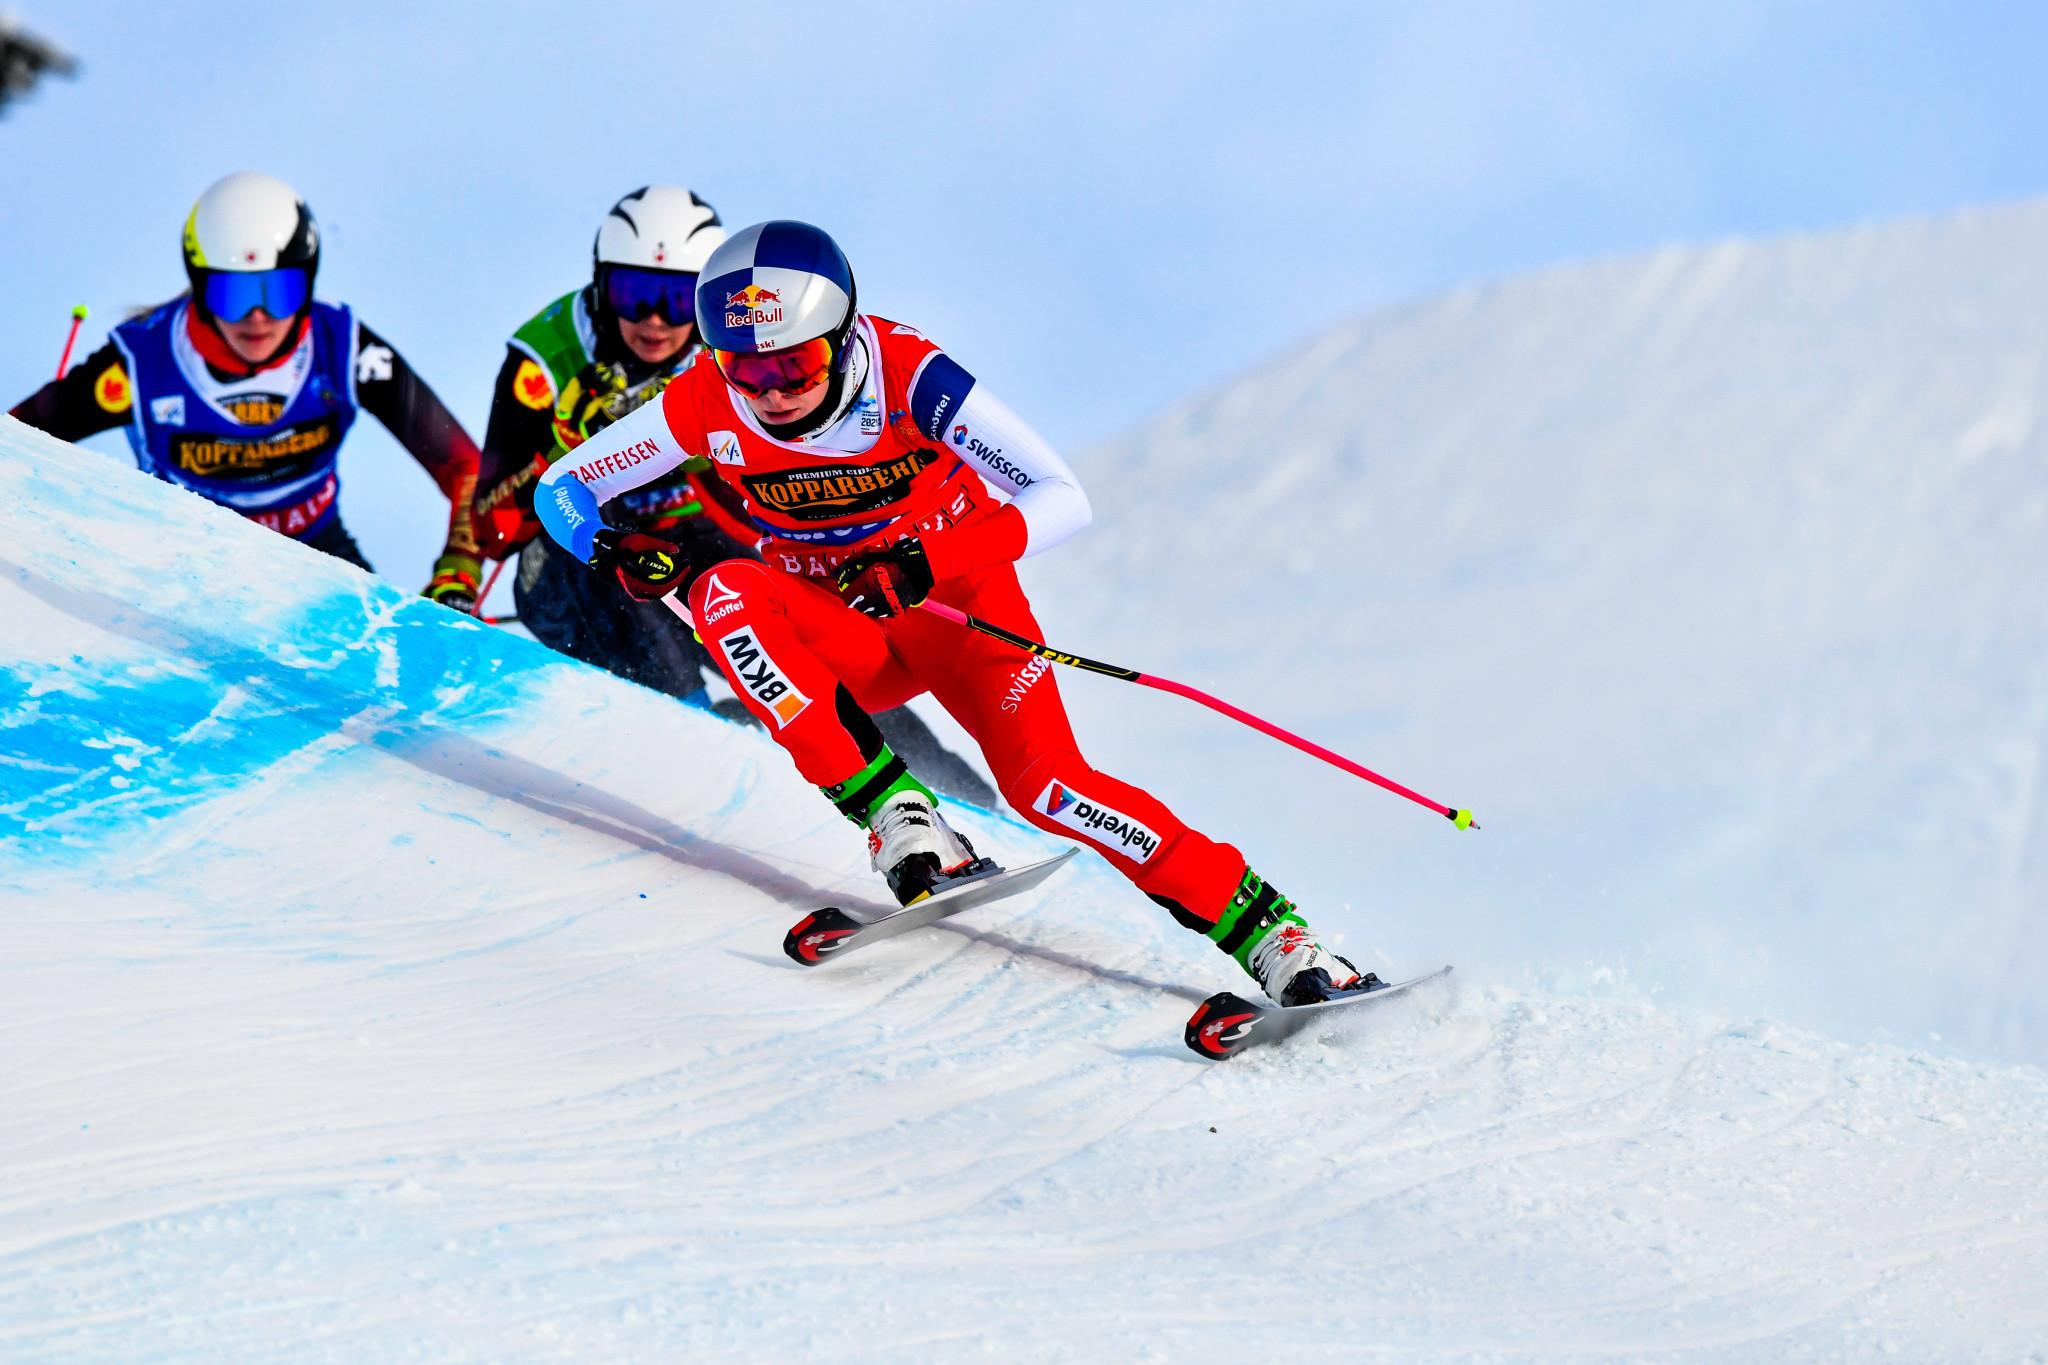 FIS Ski Cross World Cup to resume in Bakuriani as end of season nears